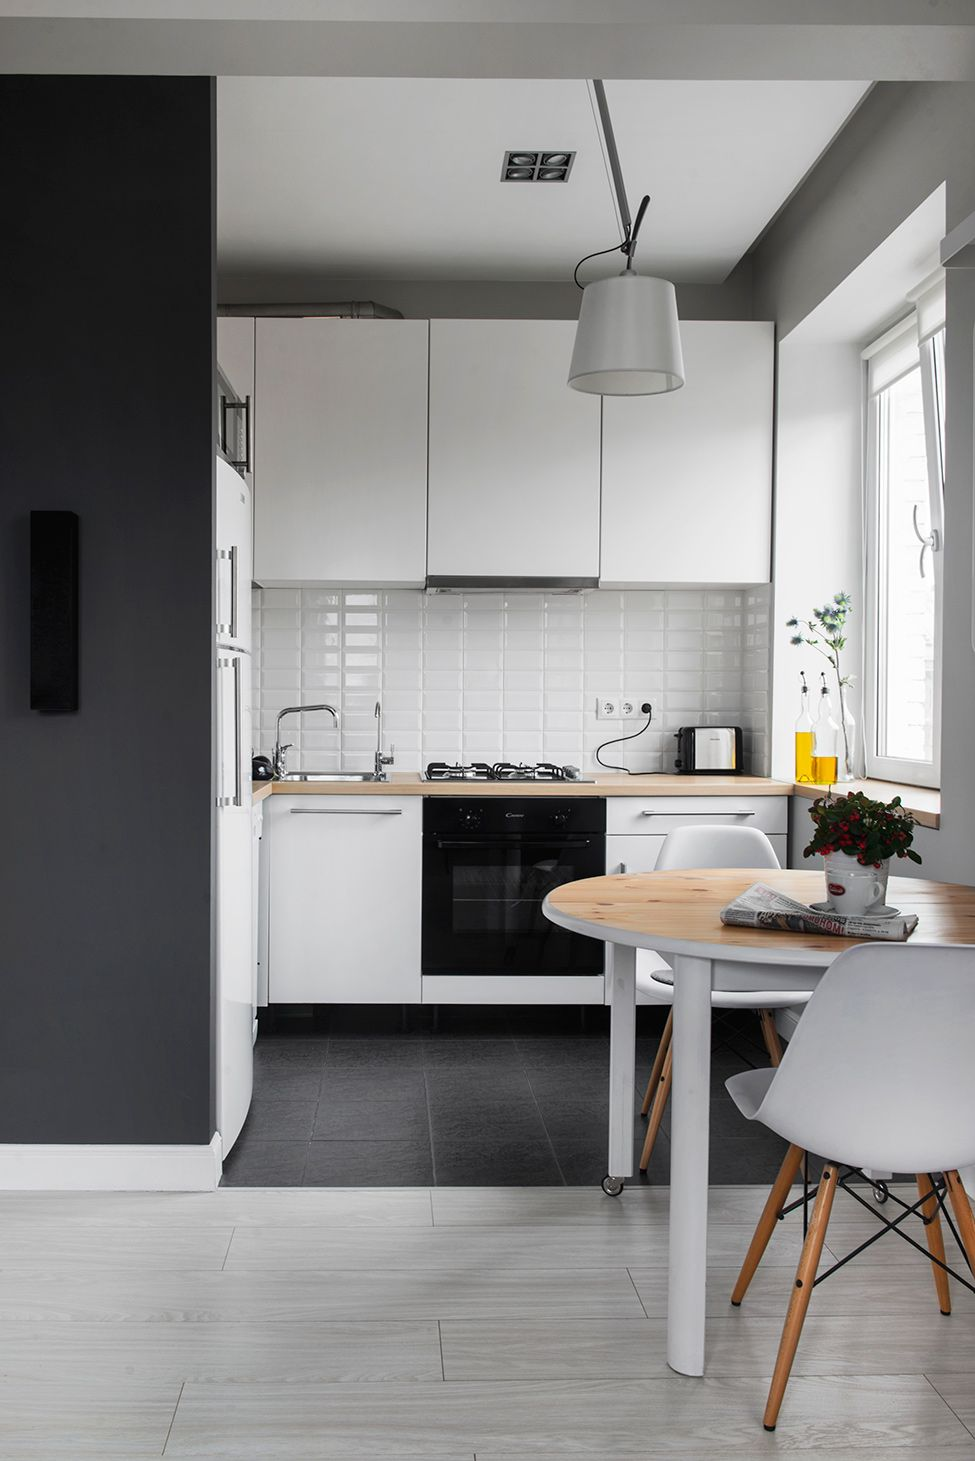 Virtuvė - pliusai, minusai (с изображениями)  Небольшие кухни